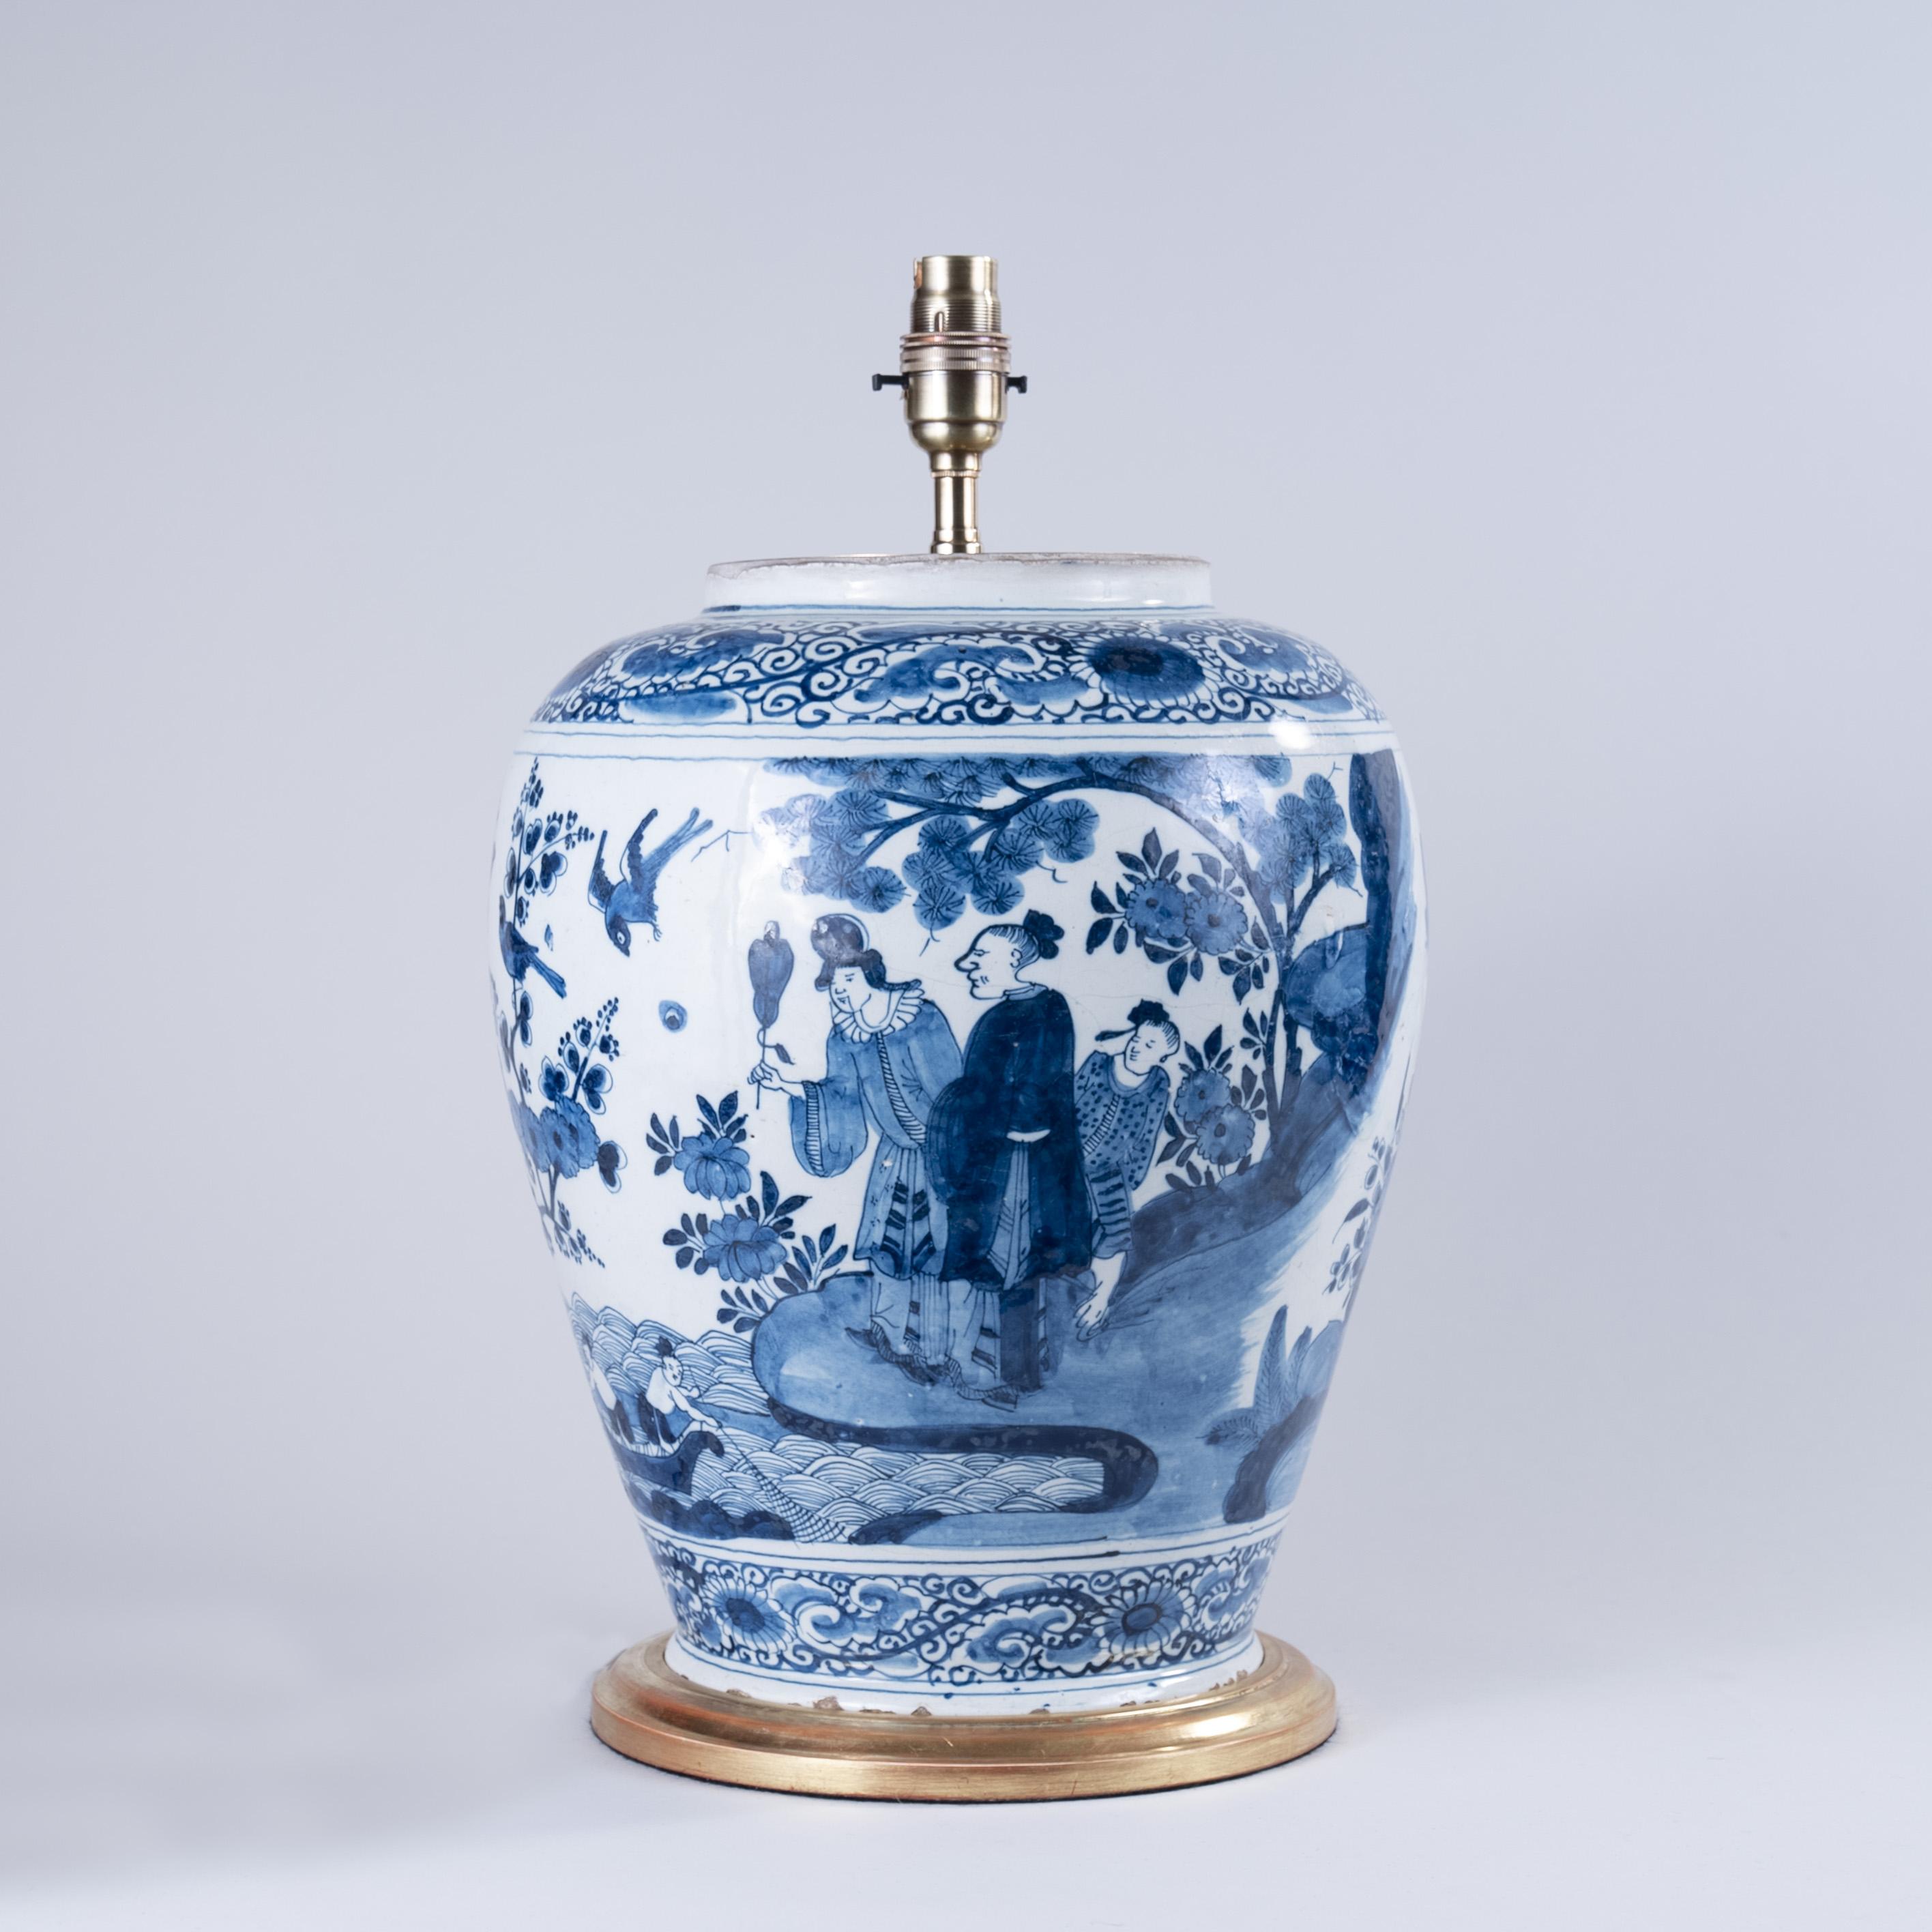 Late 17th century Dutch Delft Blue and White Vase